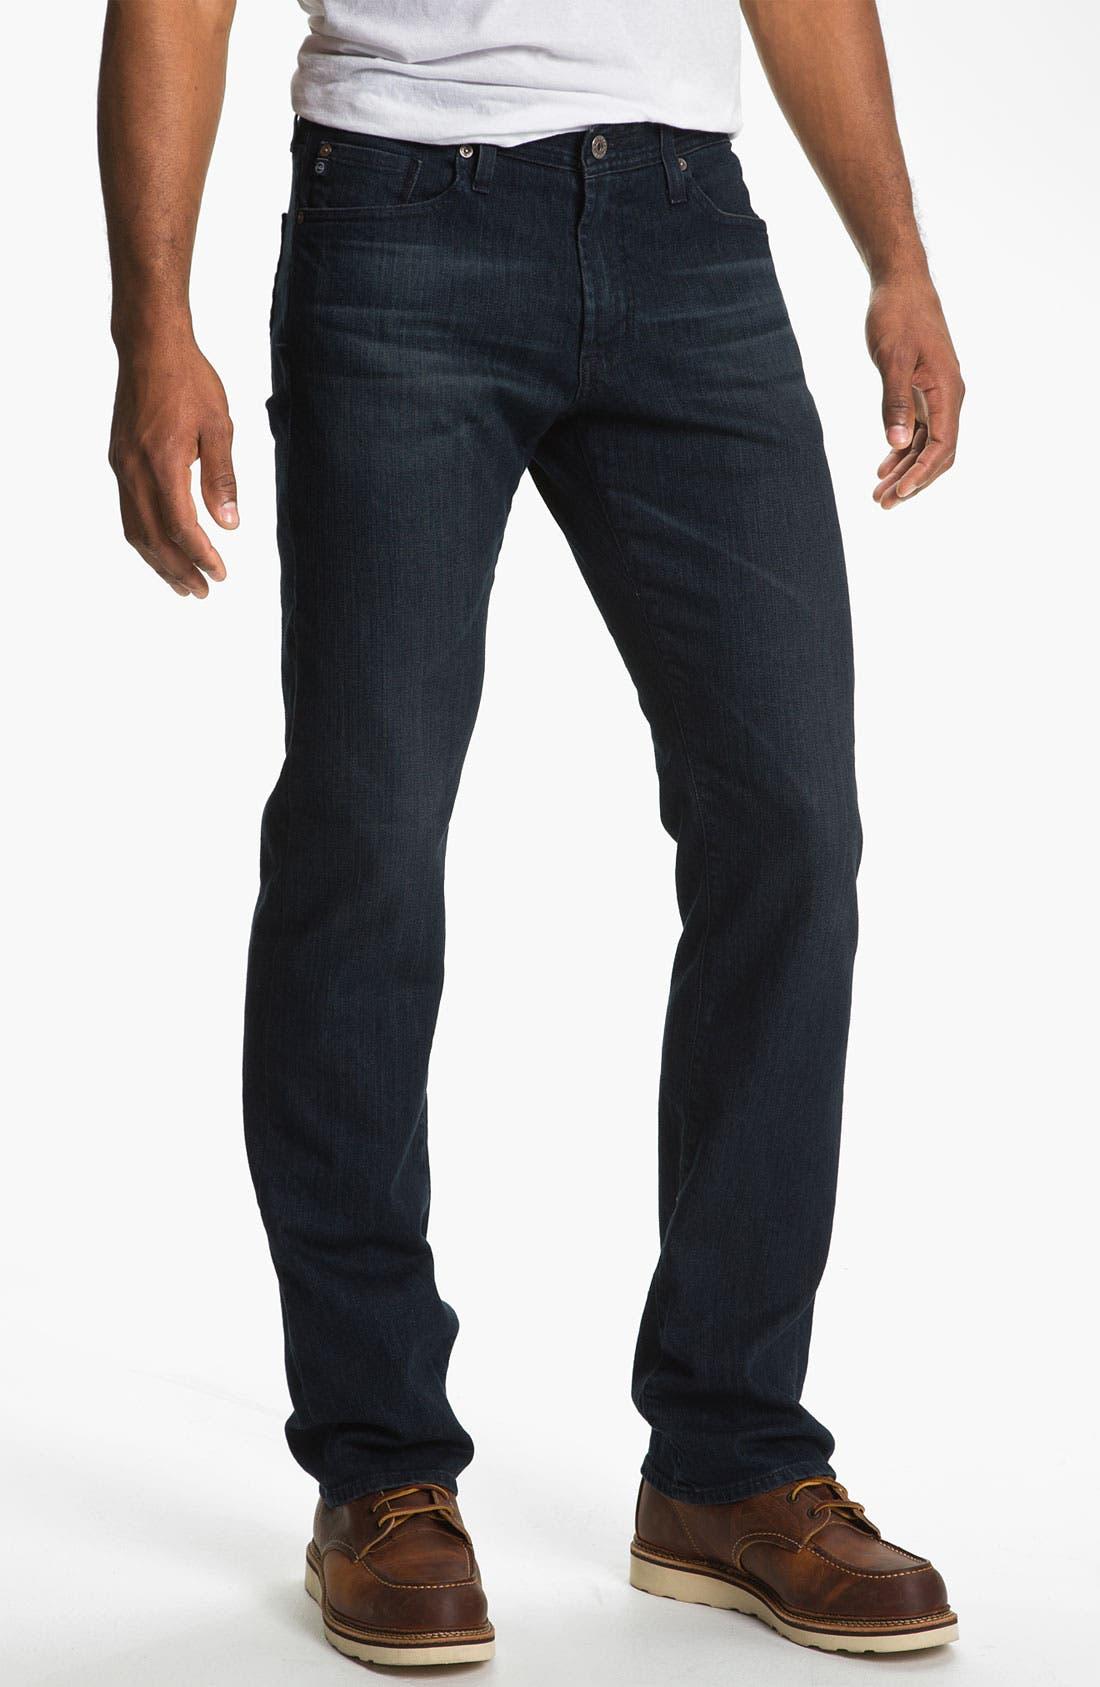 Alternate Image 1 Selected - AG Jeans 'Protégé' Straight Leg Jeans (Dock Wash)